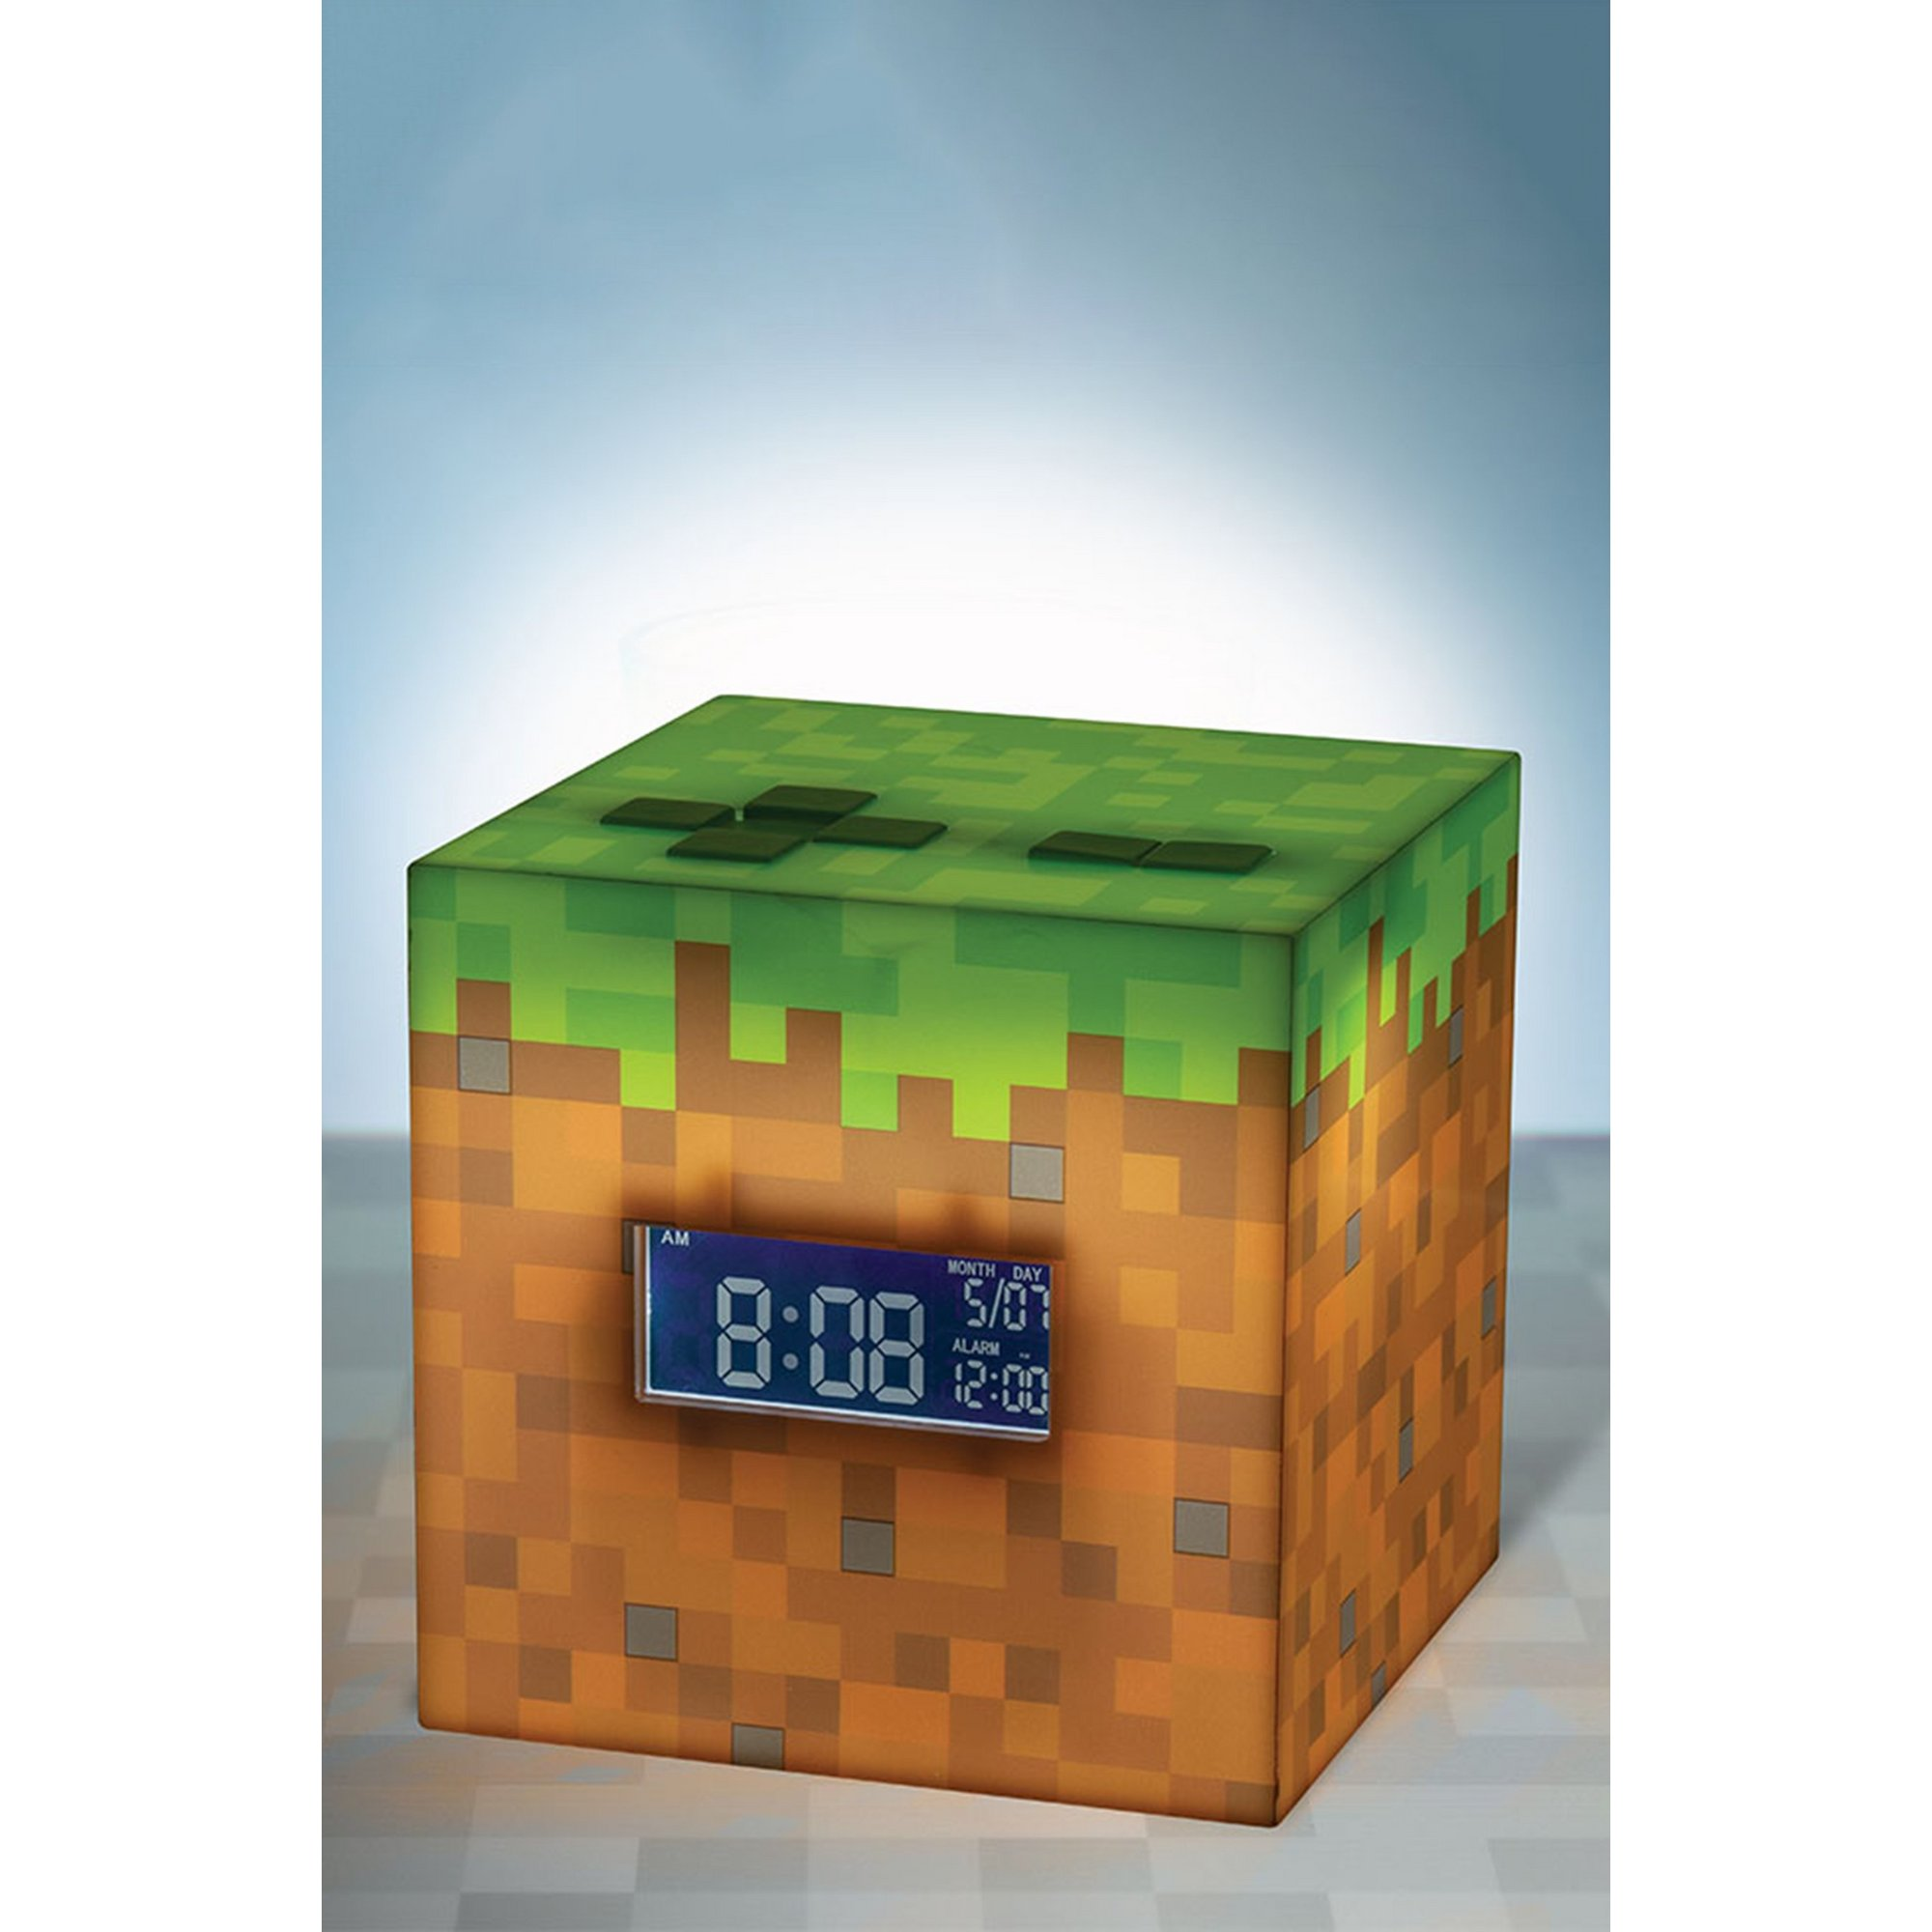 Image of Minecraft Alarm Clock